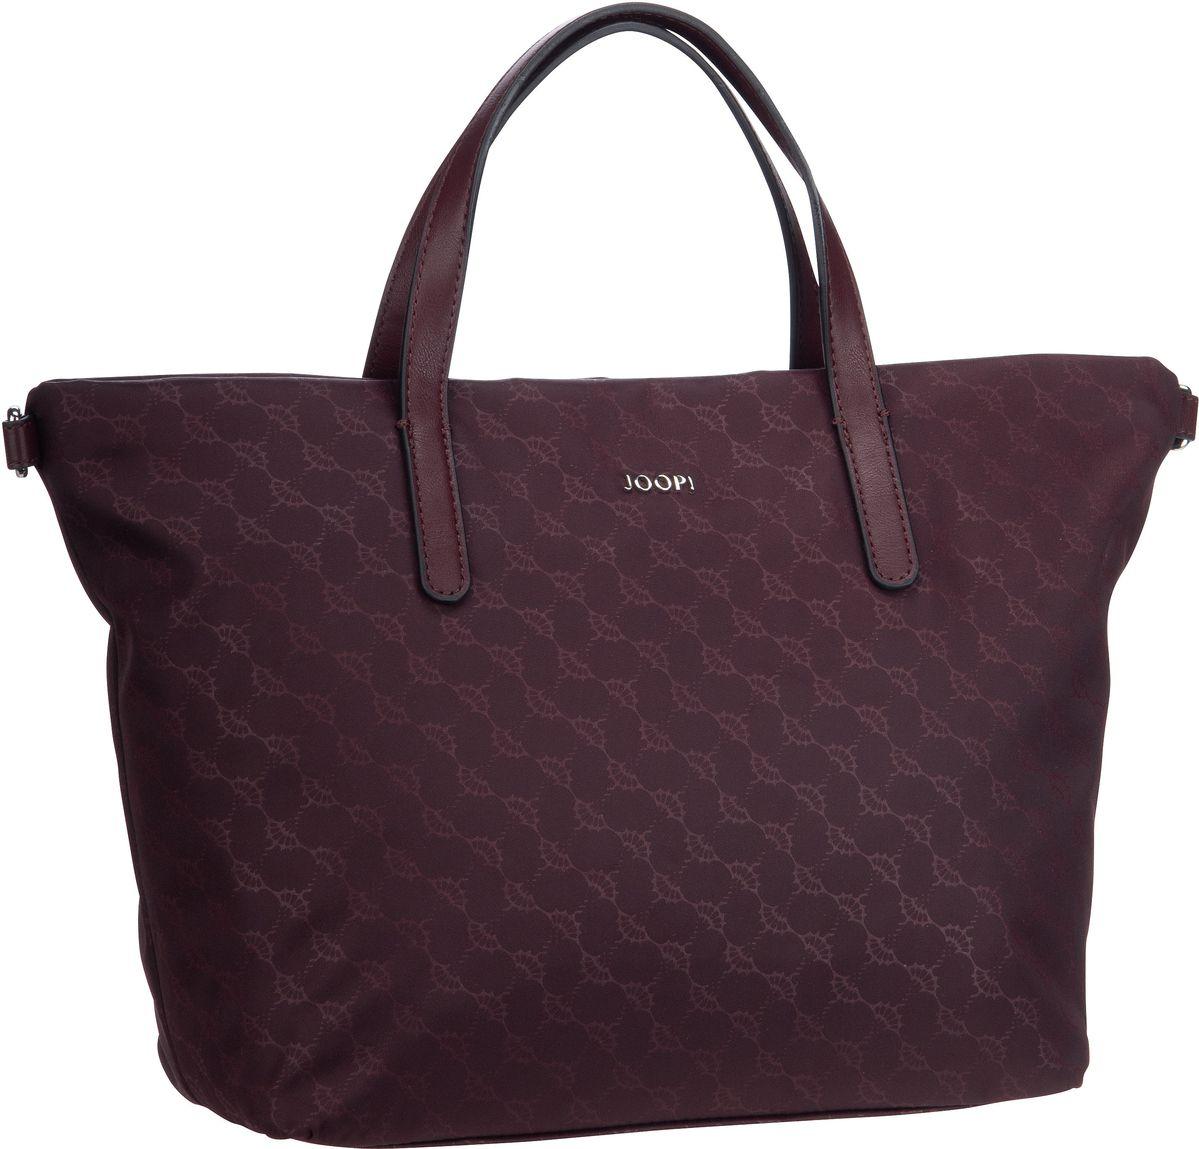 Handtasche Helena Nylon Cornflower Handbag Small Burgundy